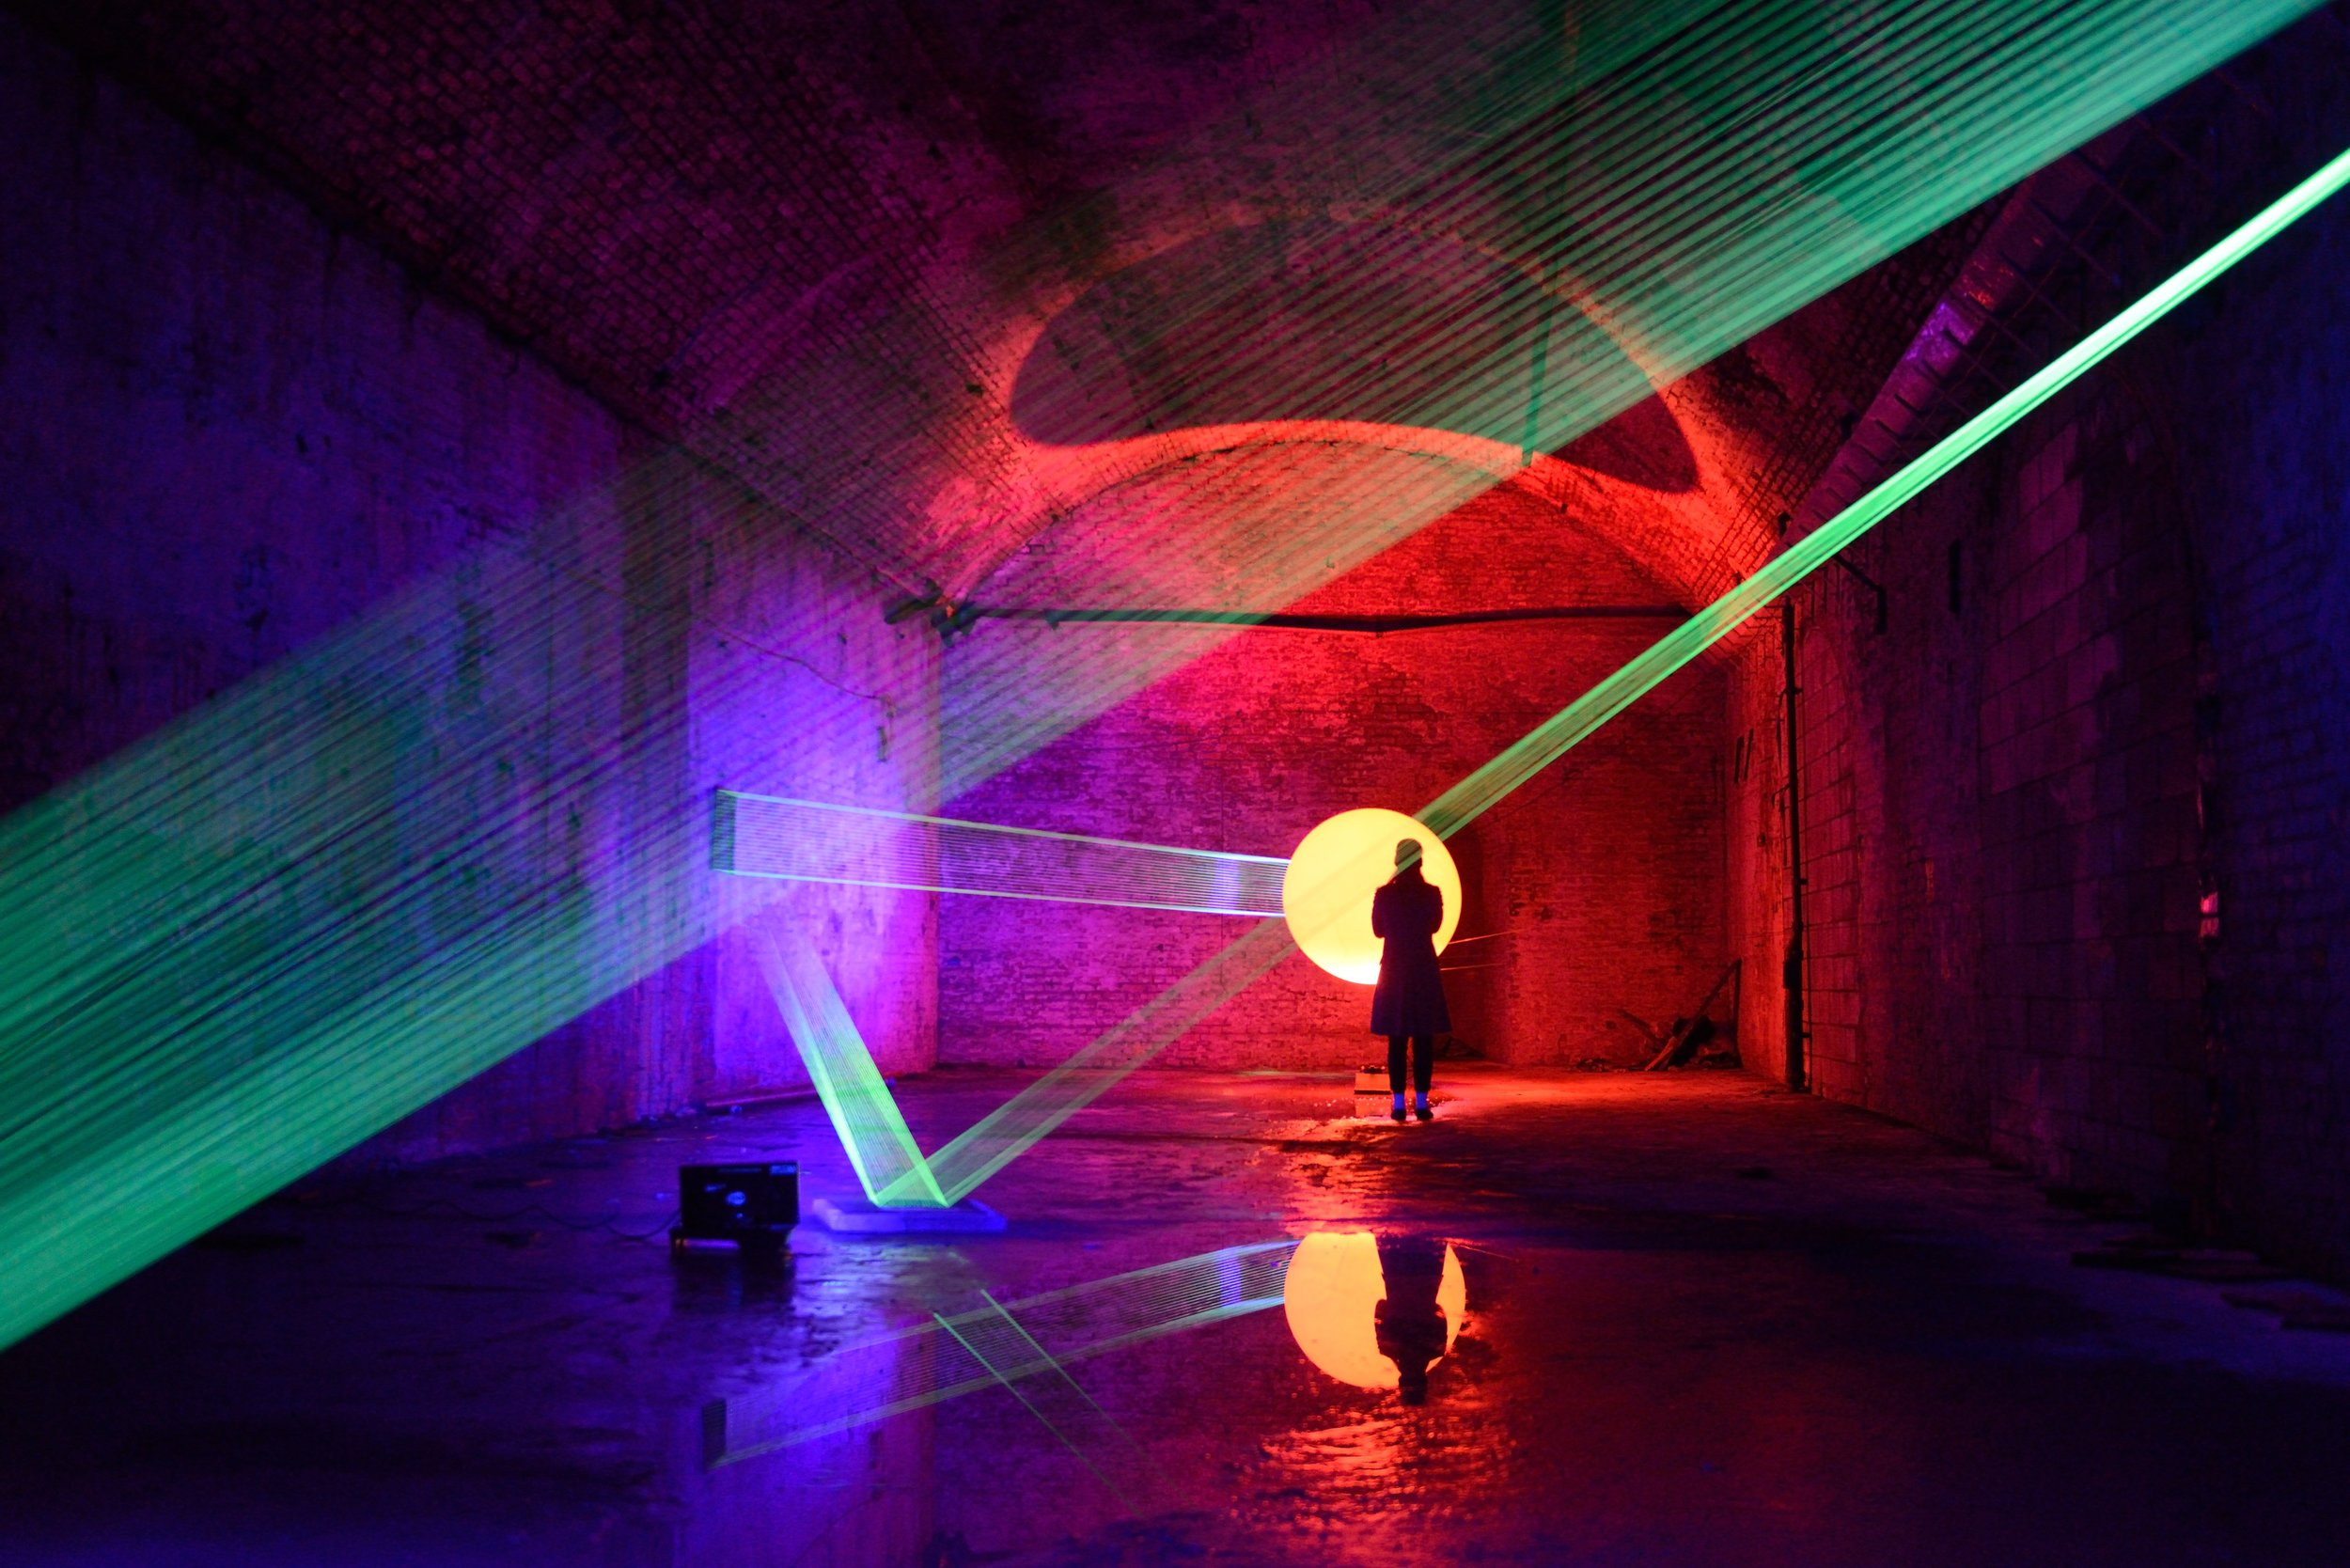 David Ogle,  08019 , Fluorescent fishing line, ultraviolet light, weather balloon, red halogen light , 2013